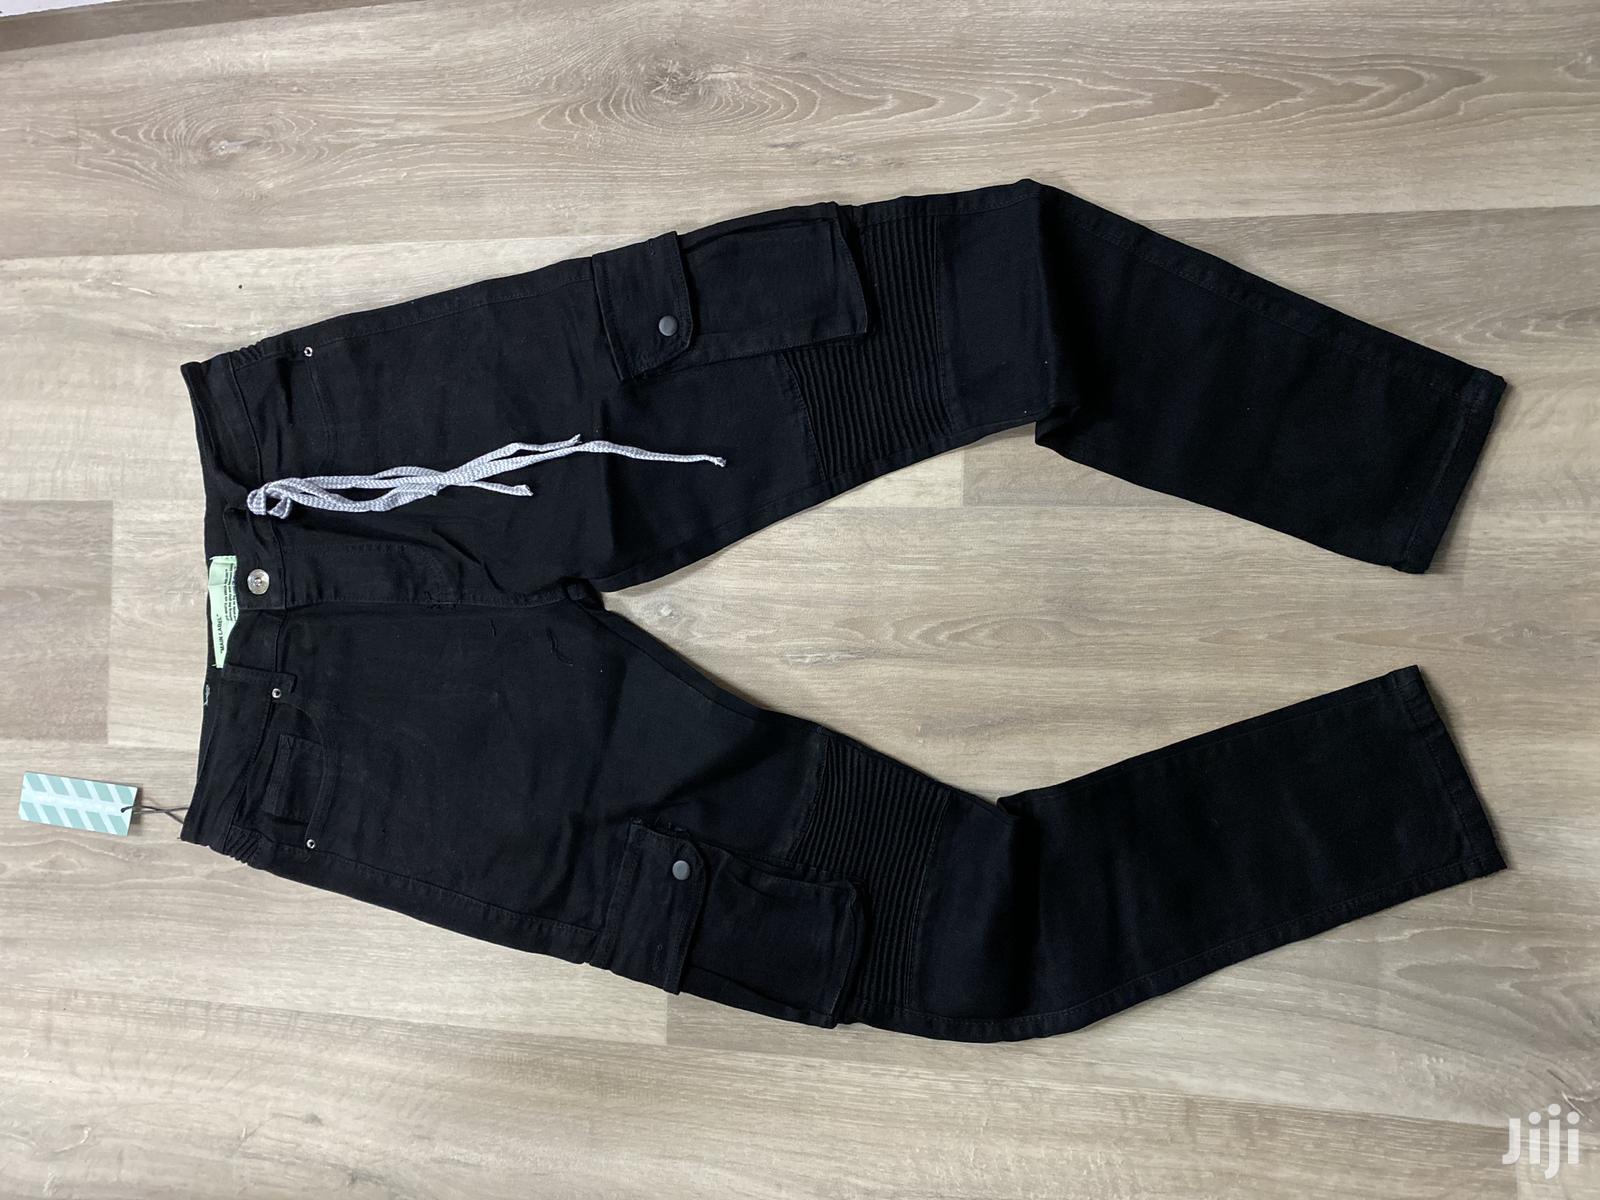 Designer Jeans Available | Clothing for sale in Nairobi Central, Nairobi, Kenya